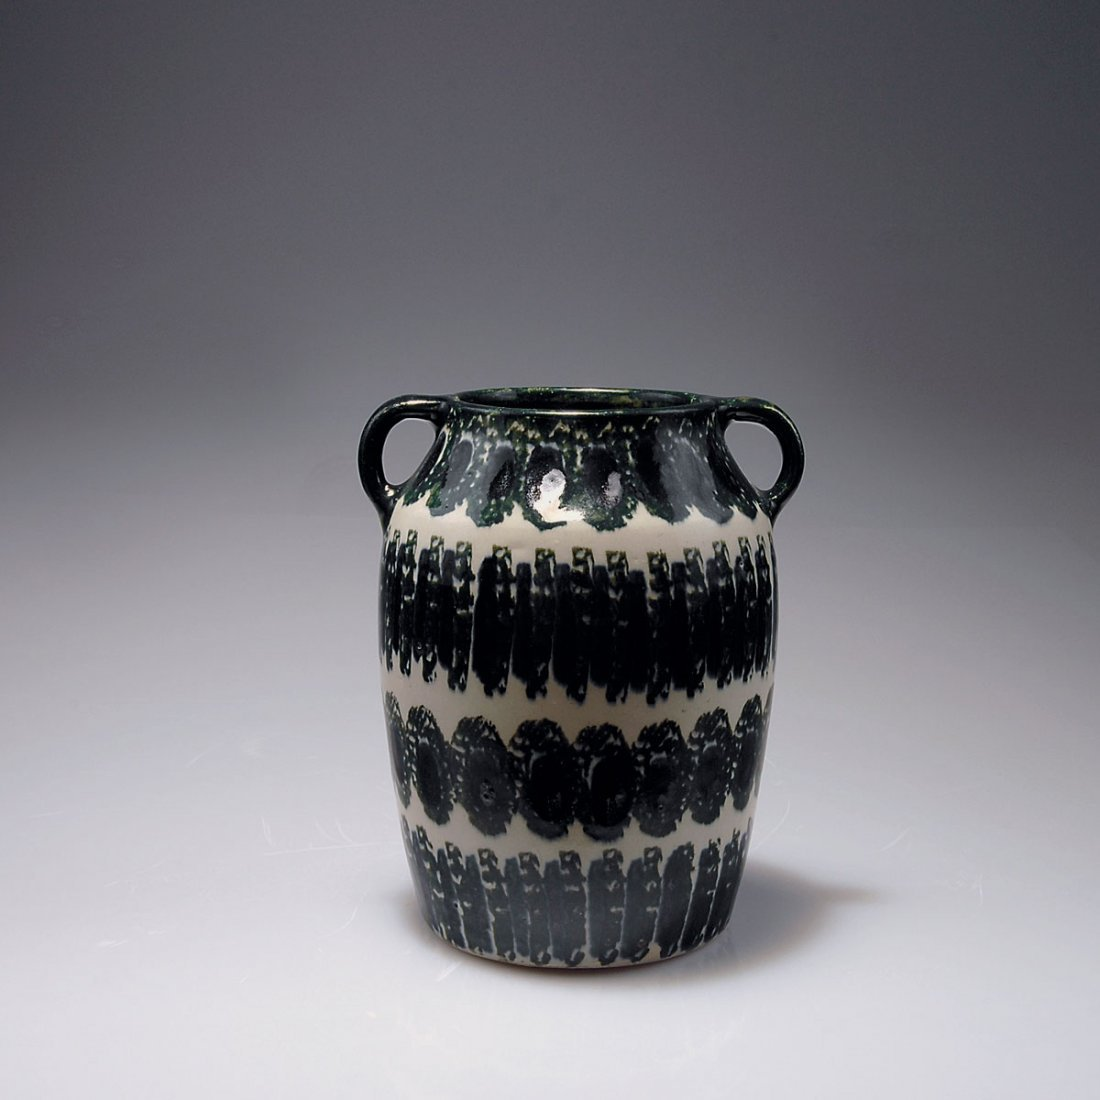 523: Vase with handles, c1912